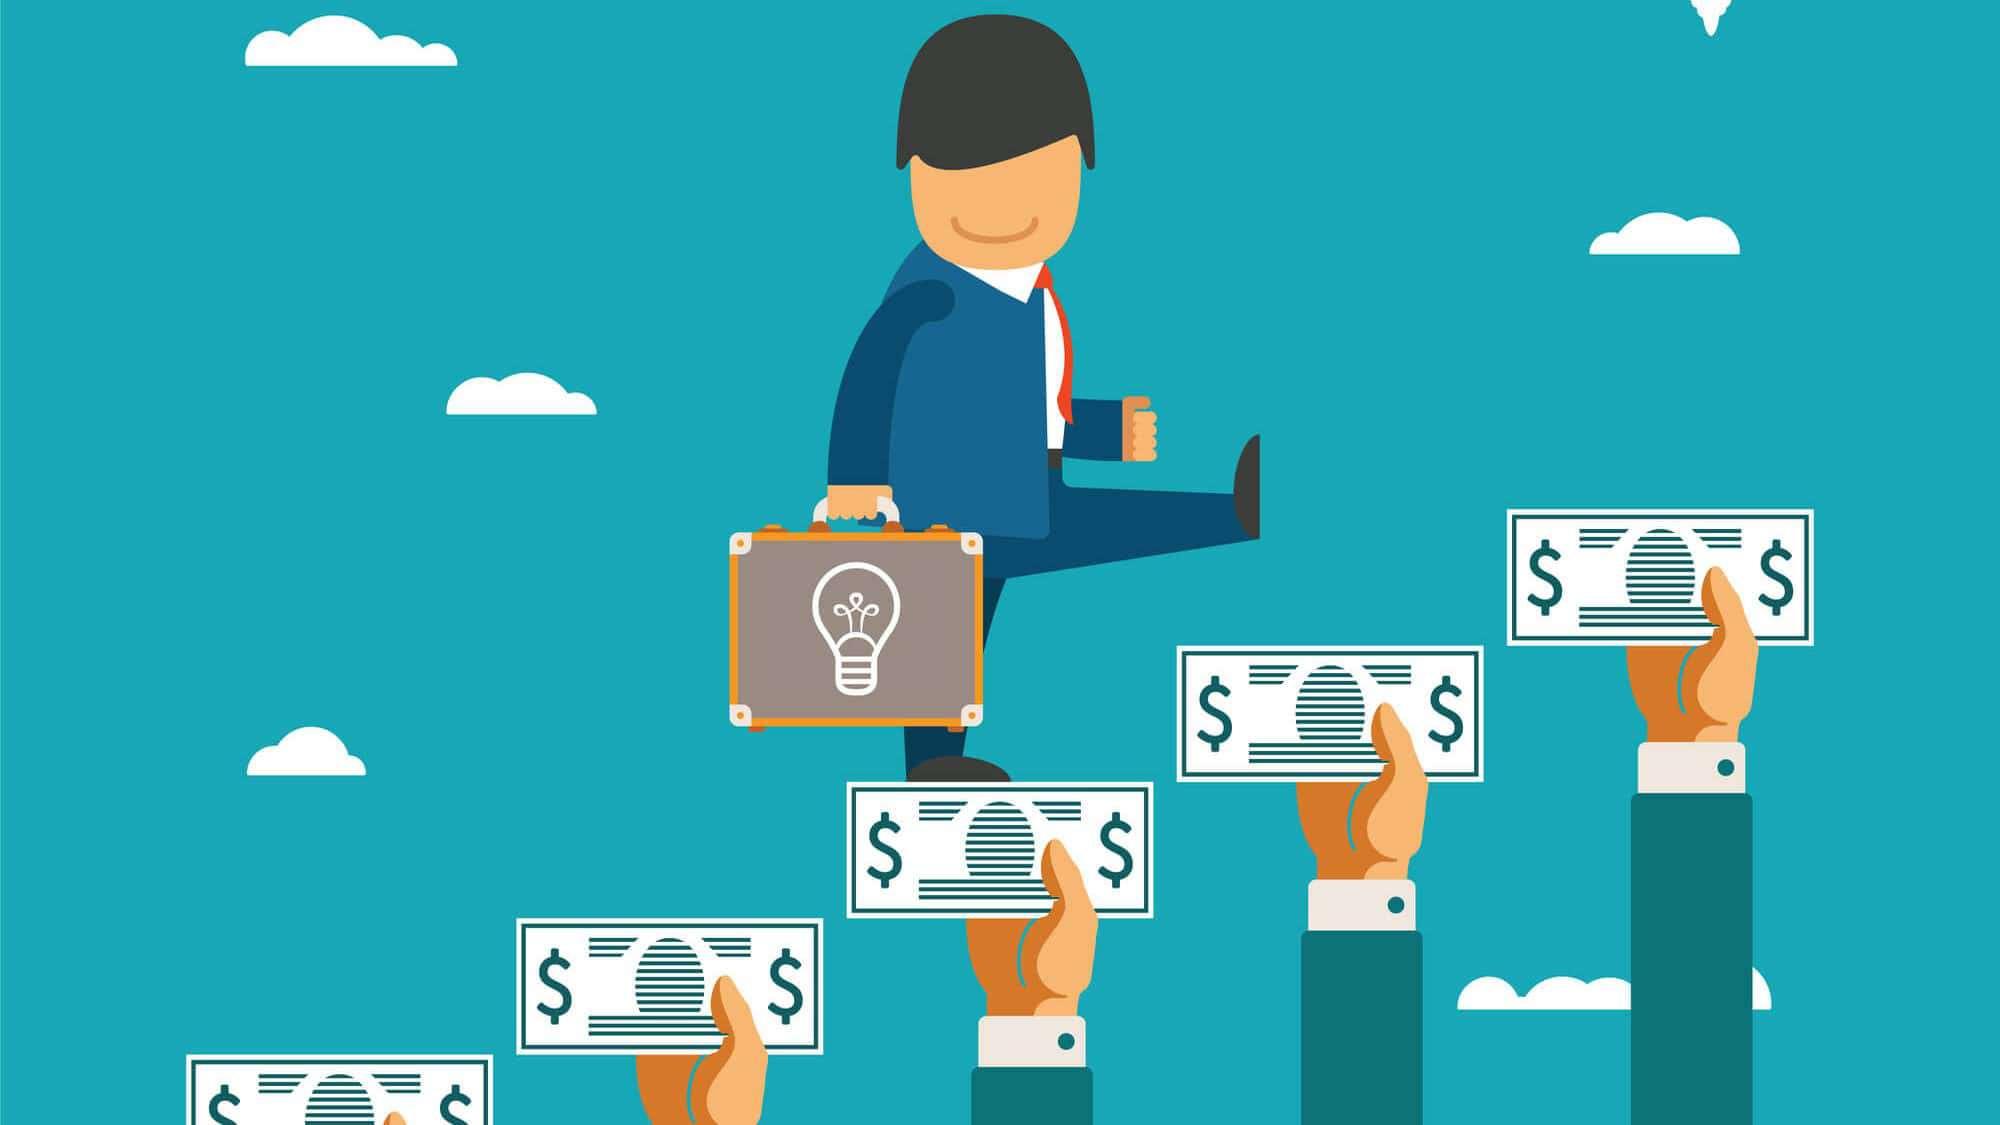 Fondo di garanzia imprese miste operanti in paesi in via disviluppo